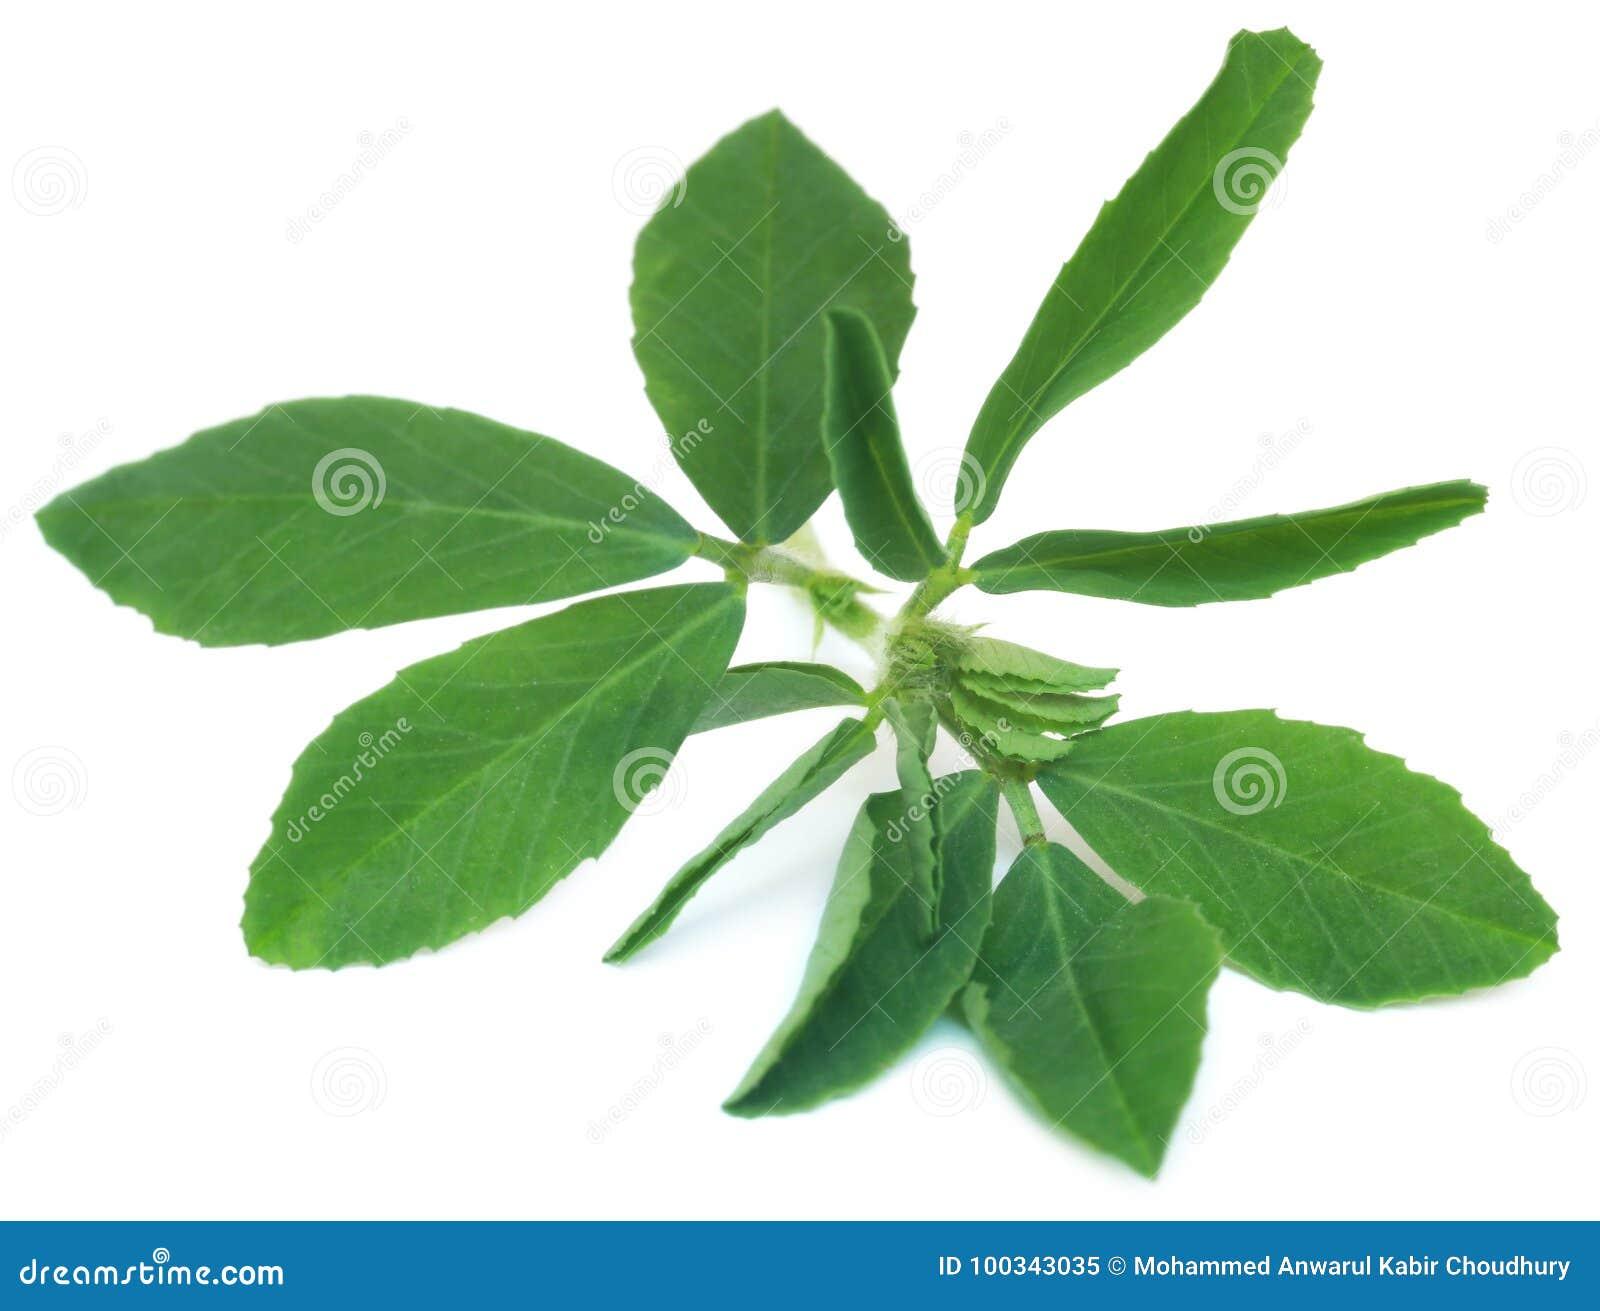 Ayurvedic fenugreek leaves